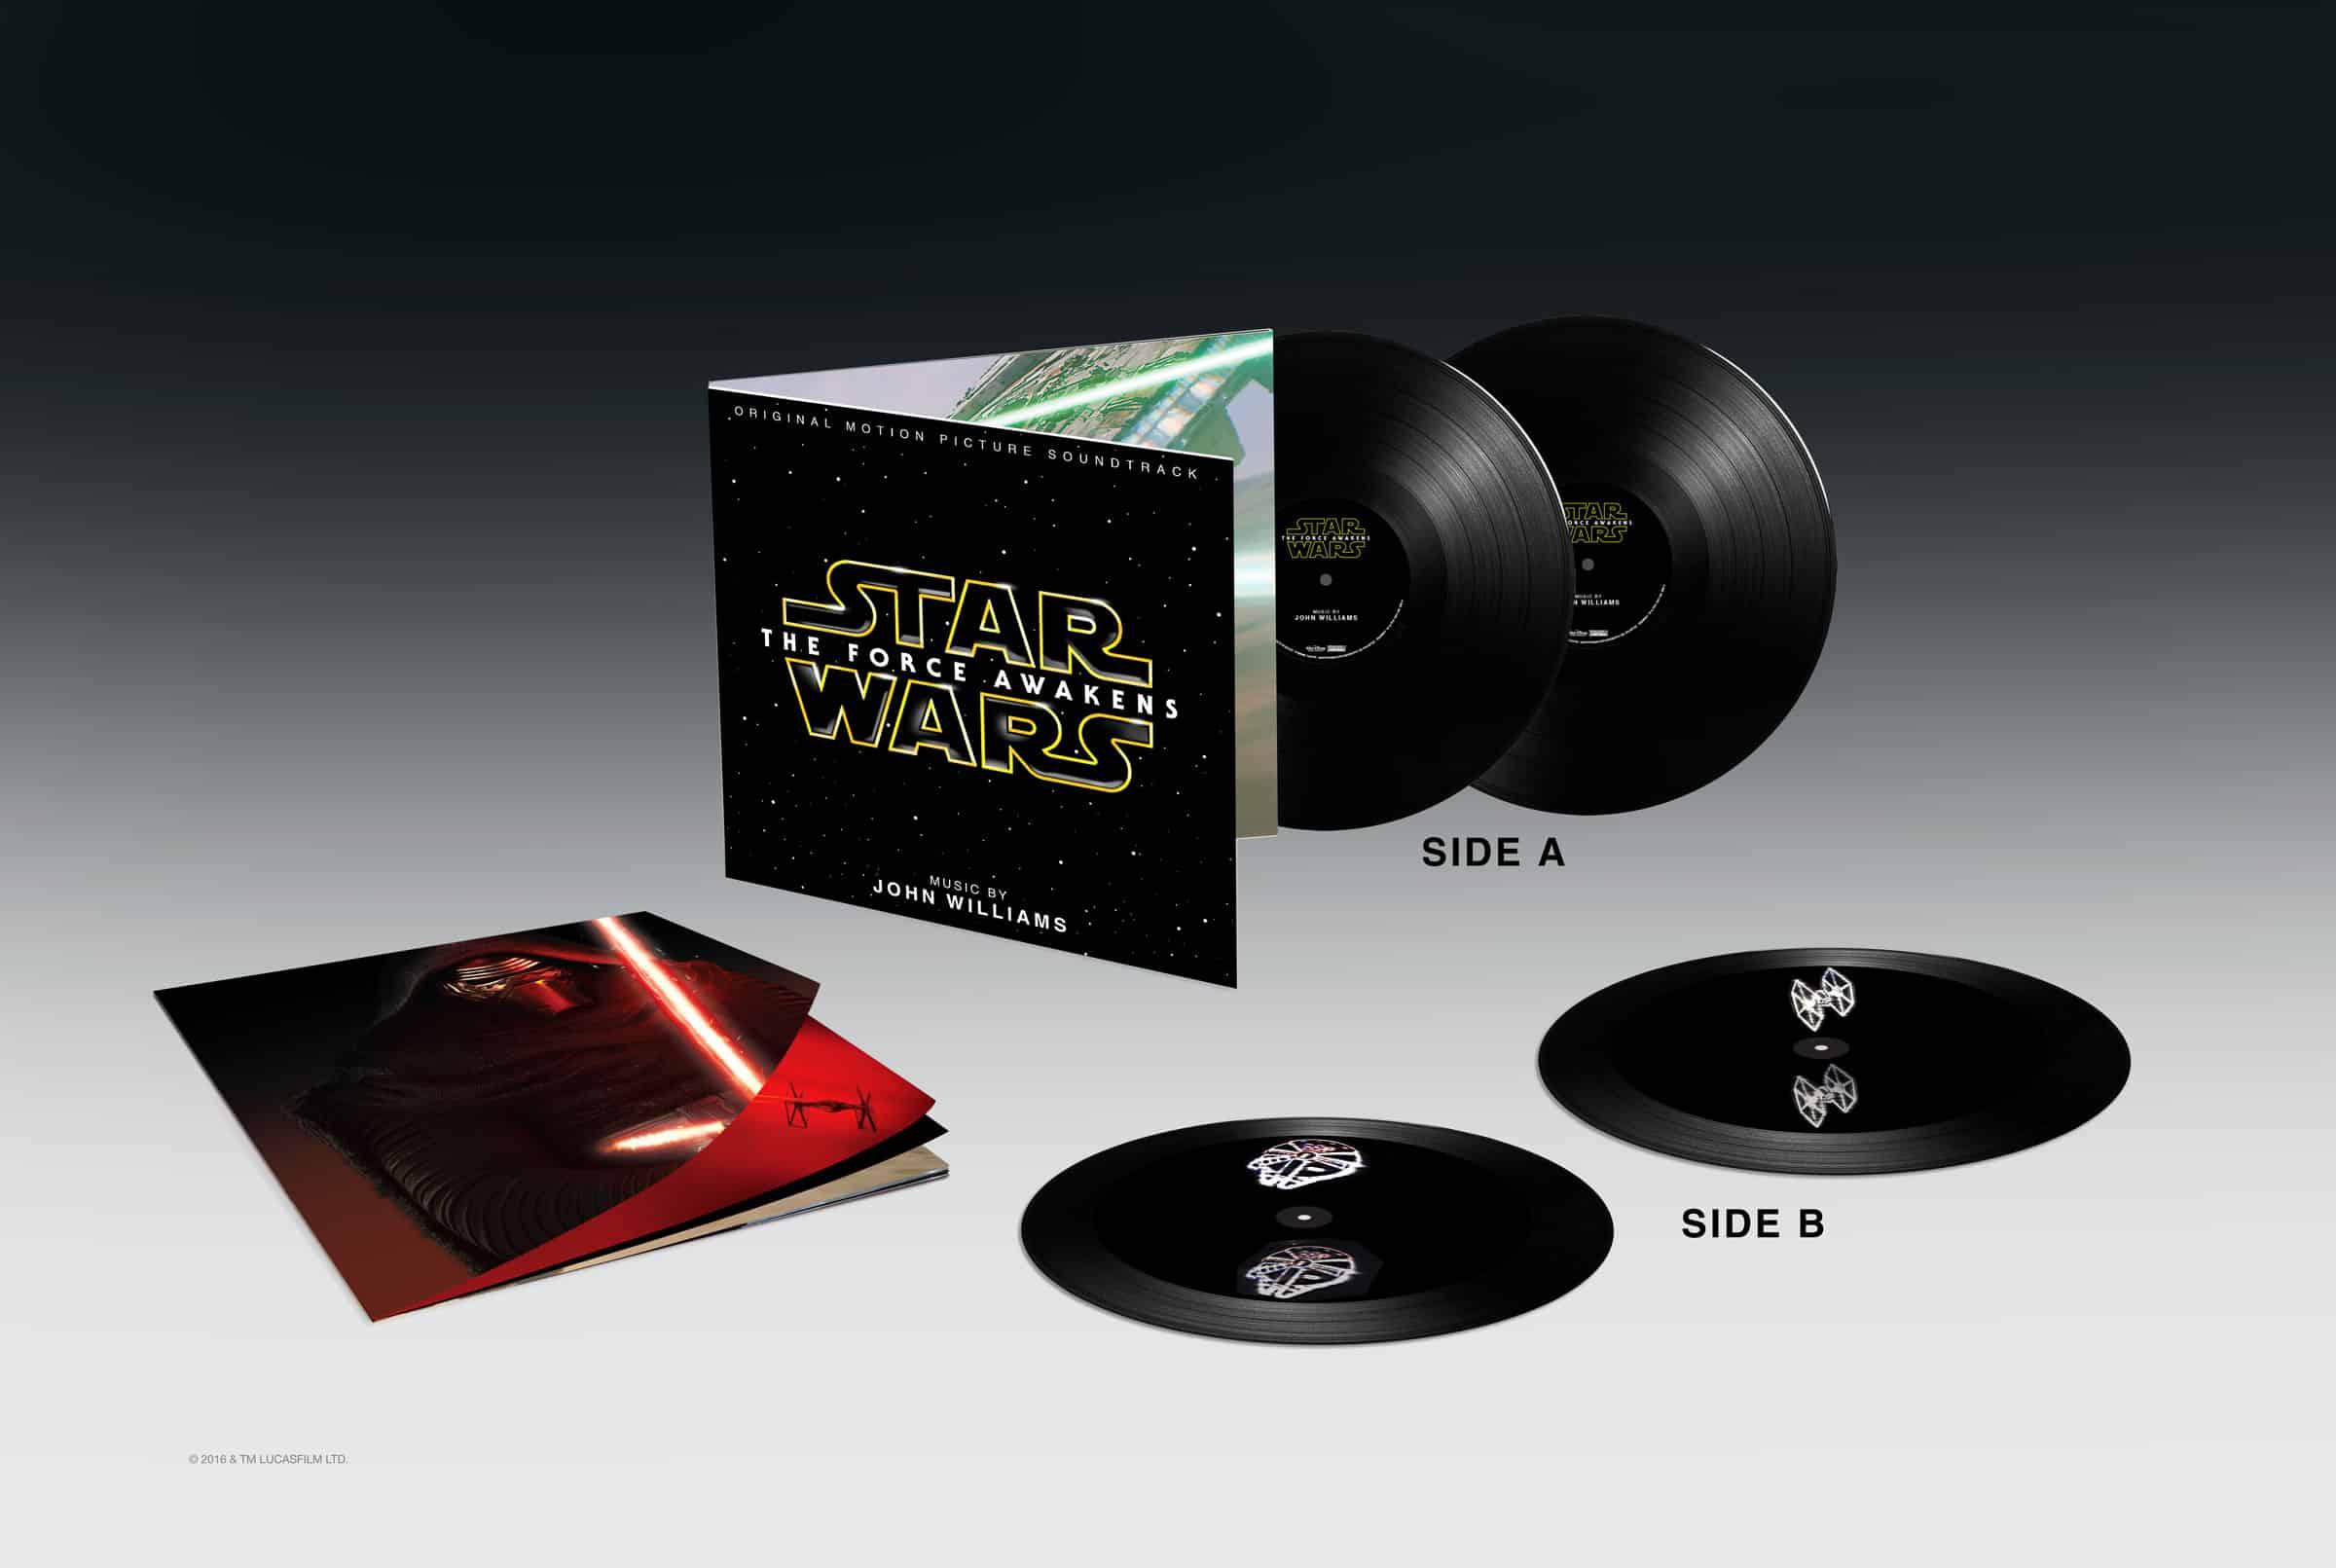 Así es el set de vinilos de The Force Awakens.